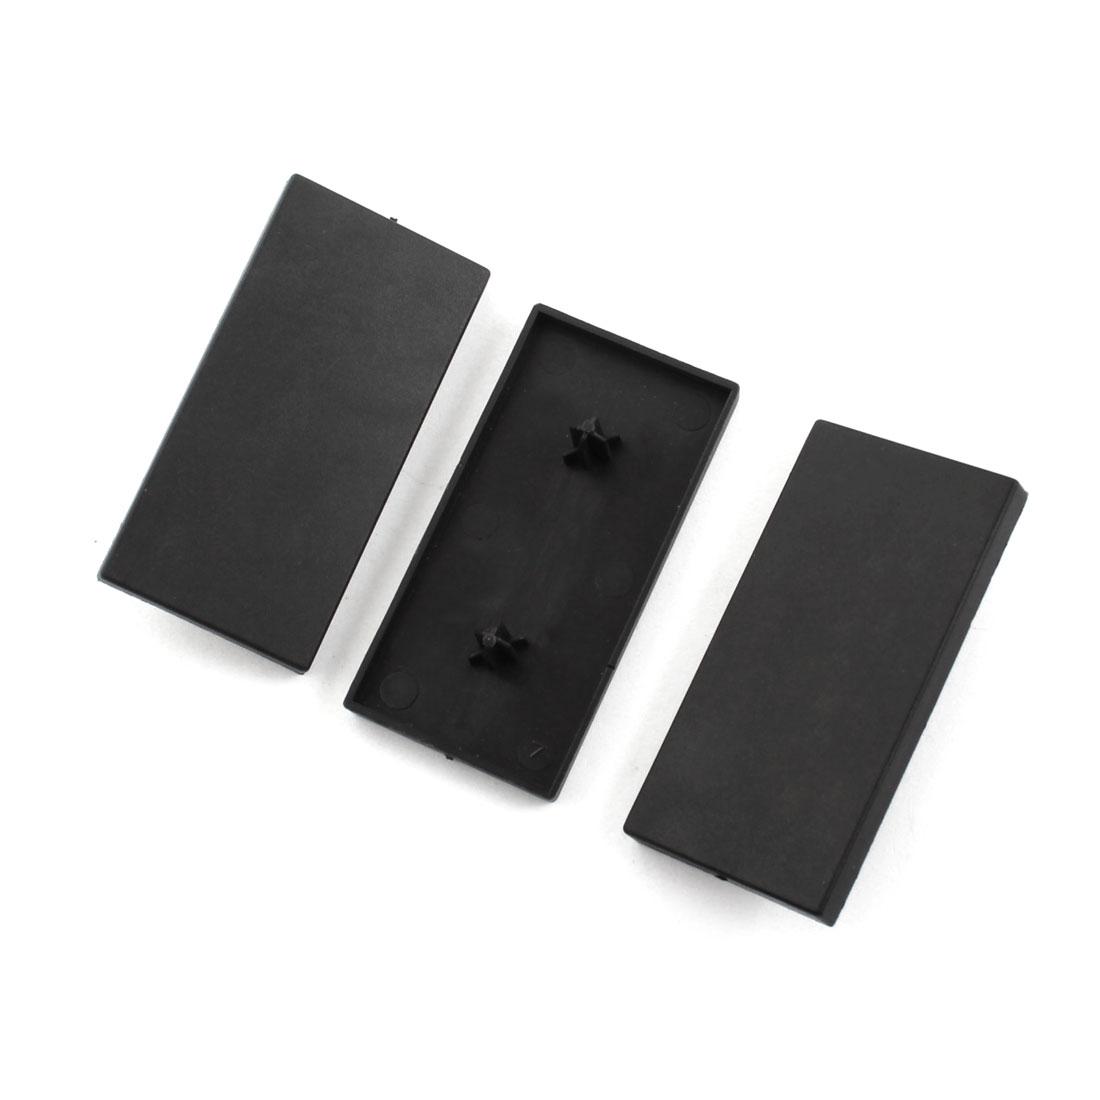 3Pcs Black Rectangle Extrusion End Cover for 60mm x 30mm T-Slot Aluminum Profile